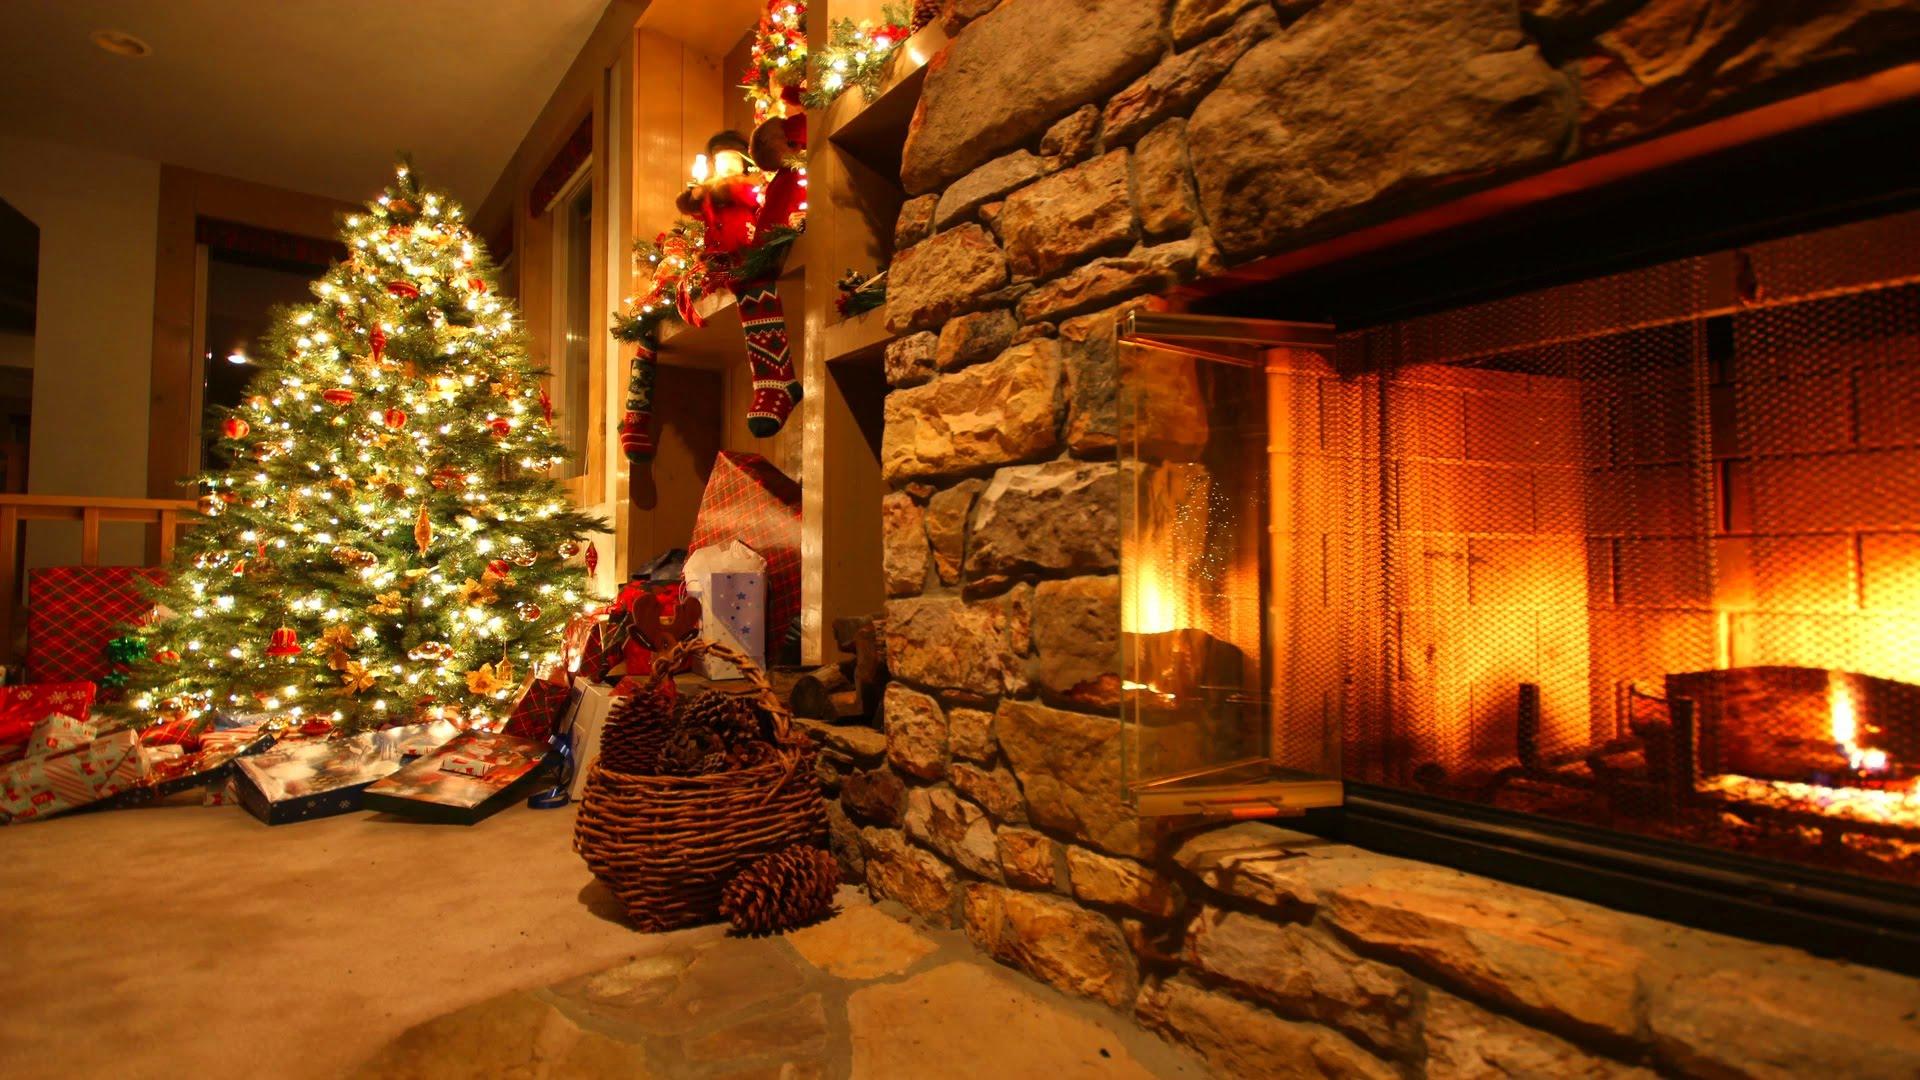 1 Hour of Christmas Music Instrumental Christmas Songs 1920x1080